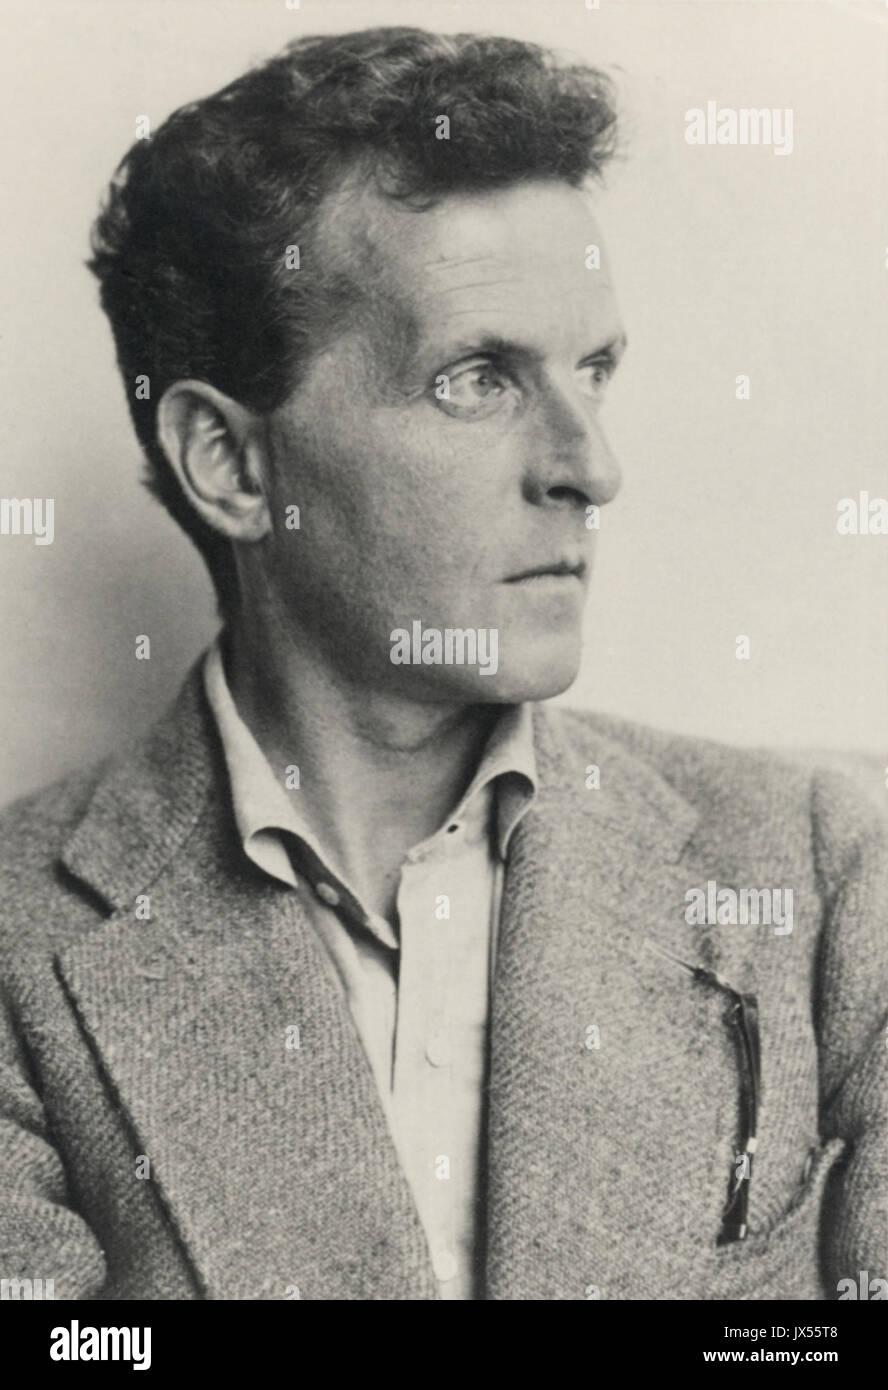 Ludwig Wittgenstein - Stock Image